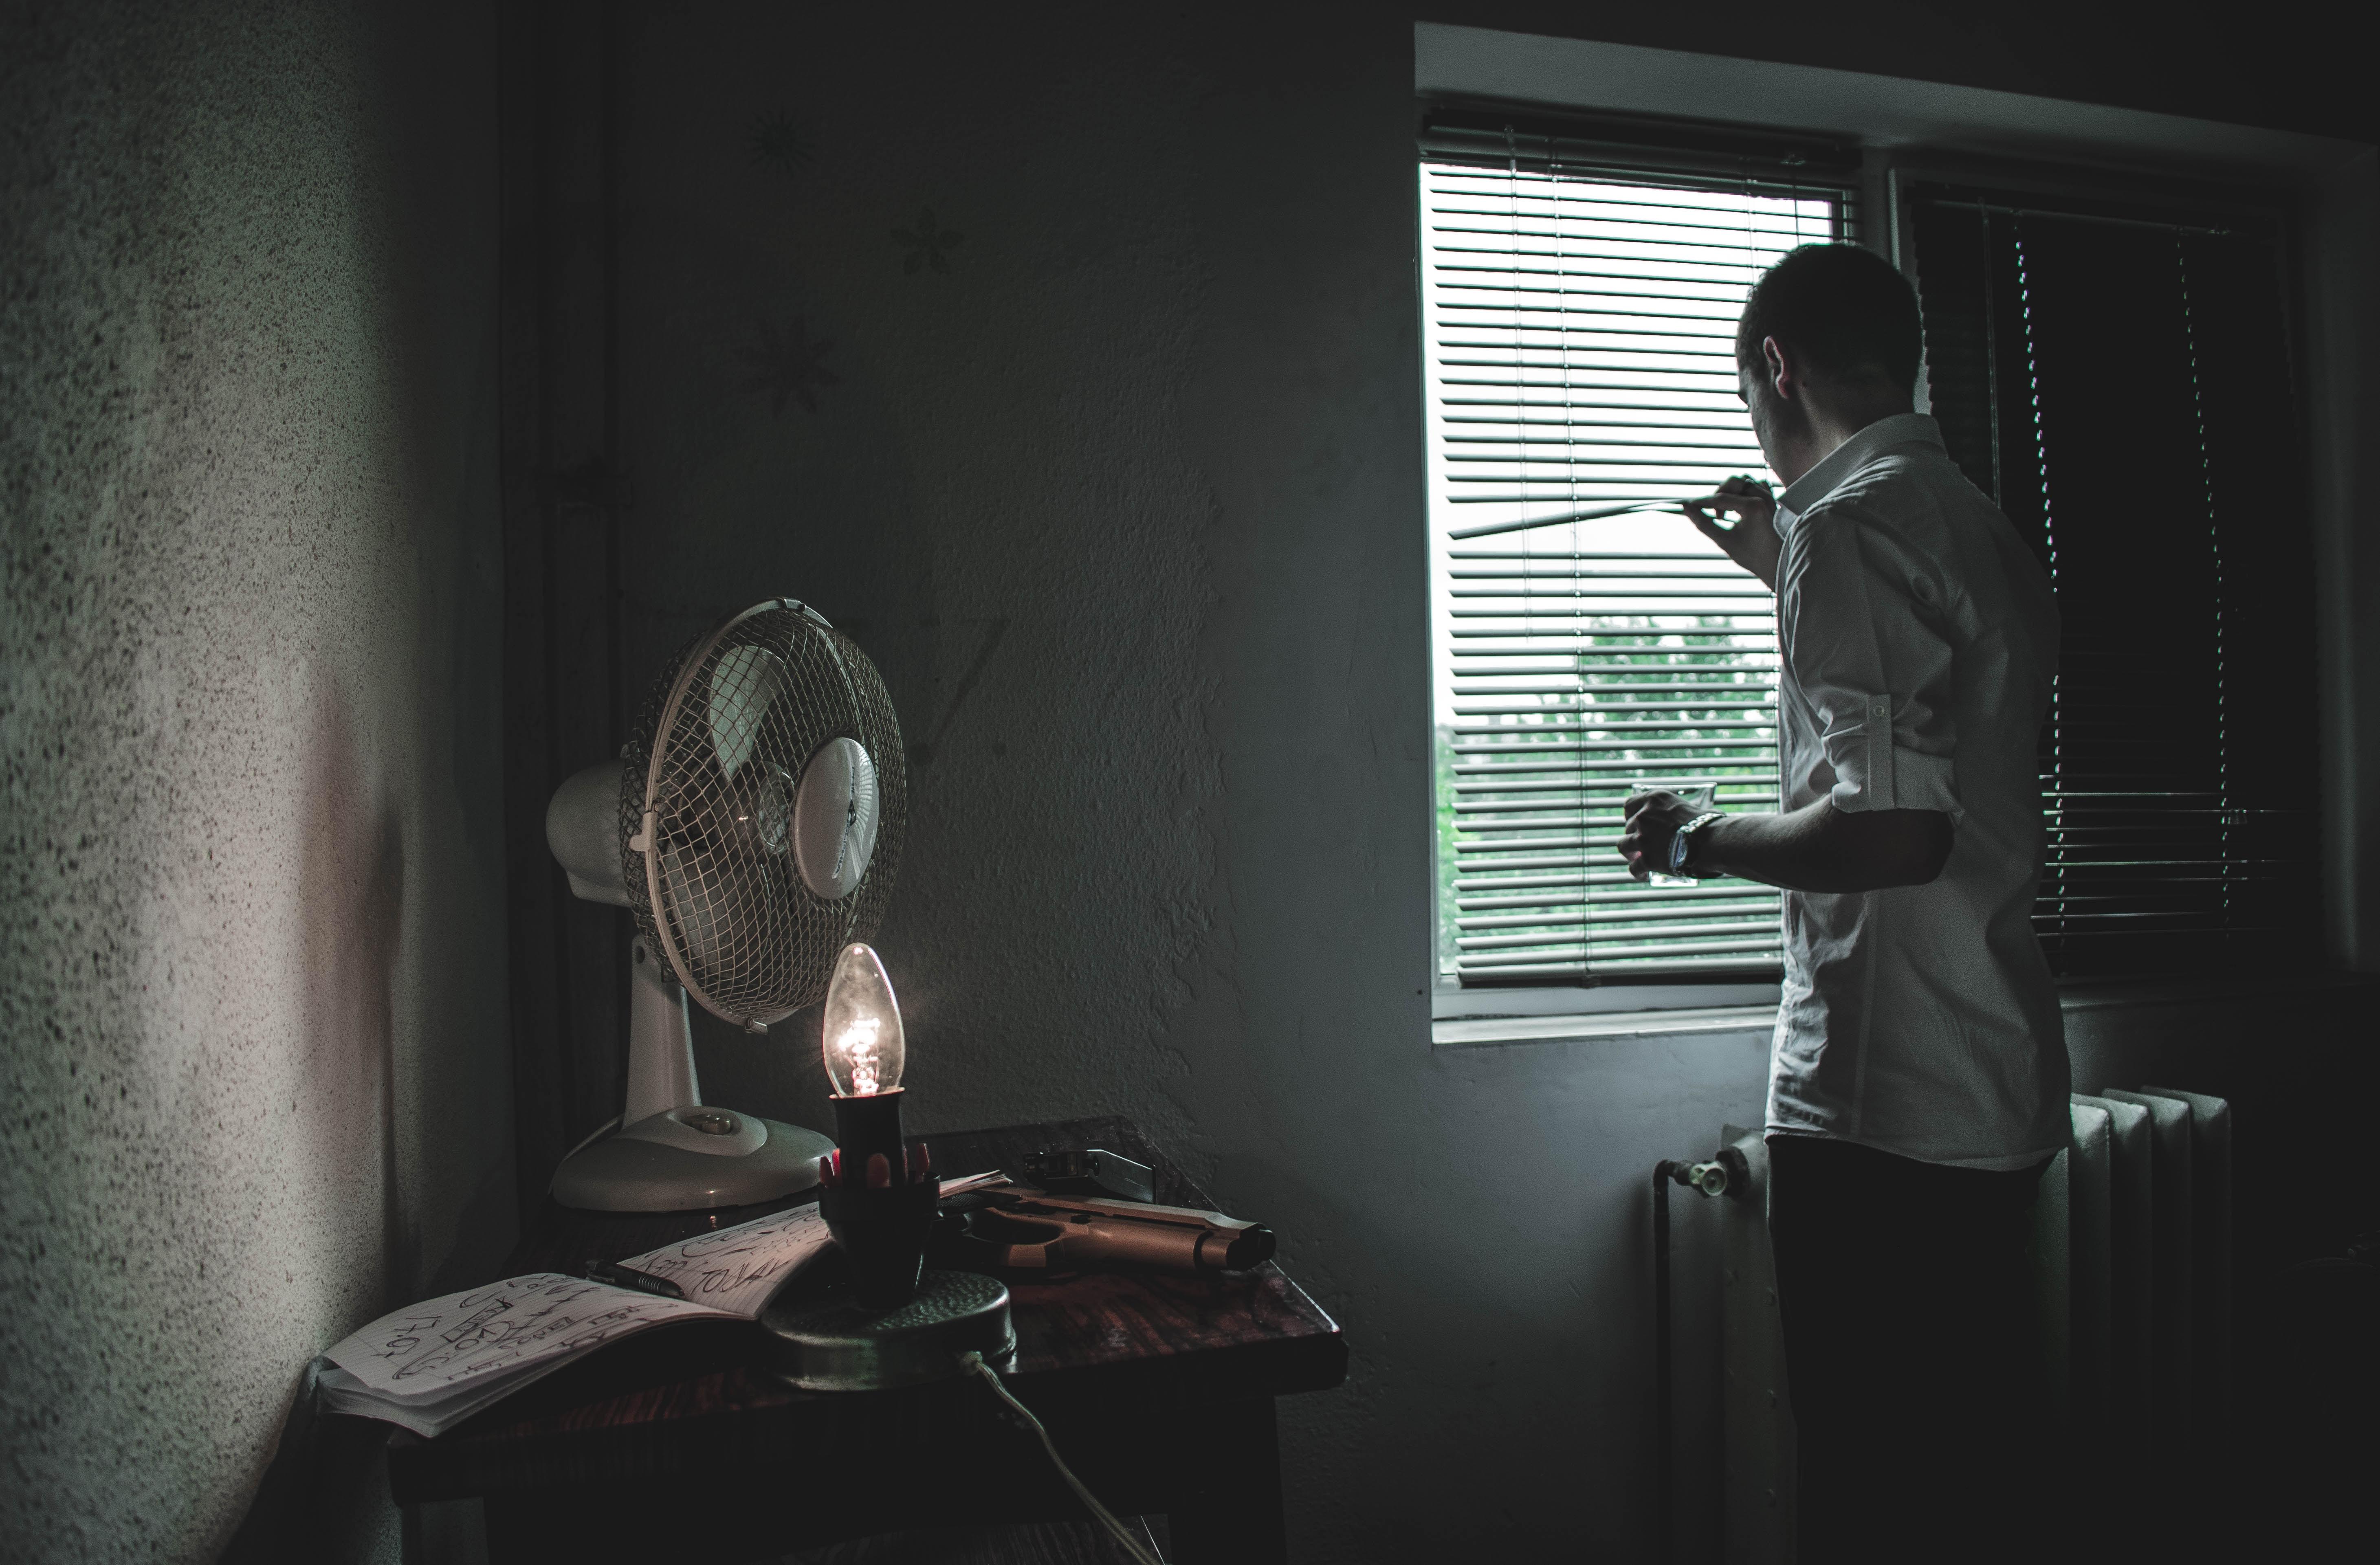 man next to window